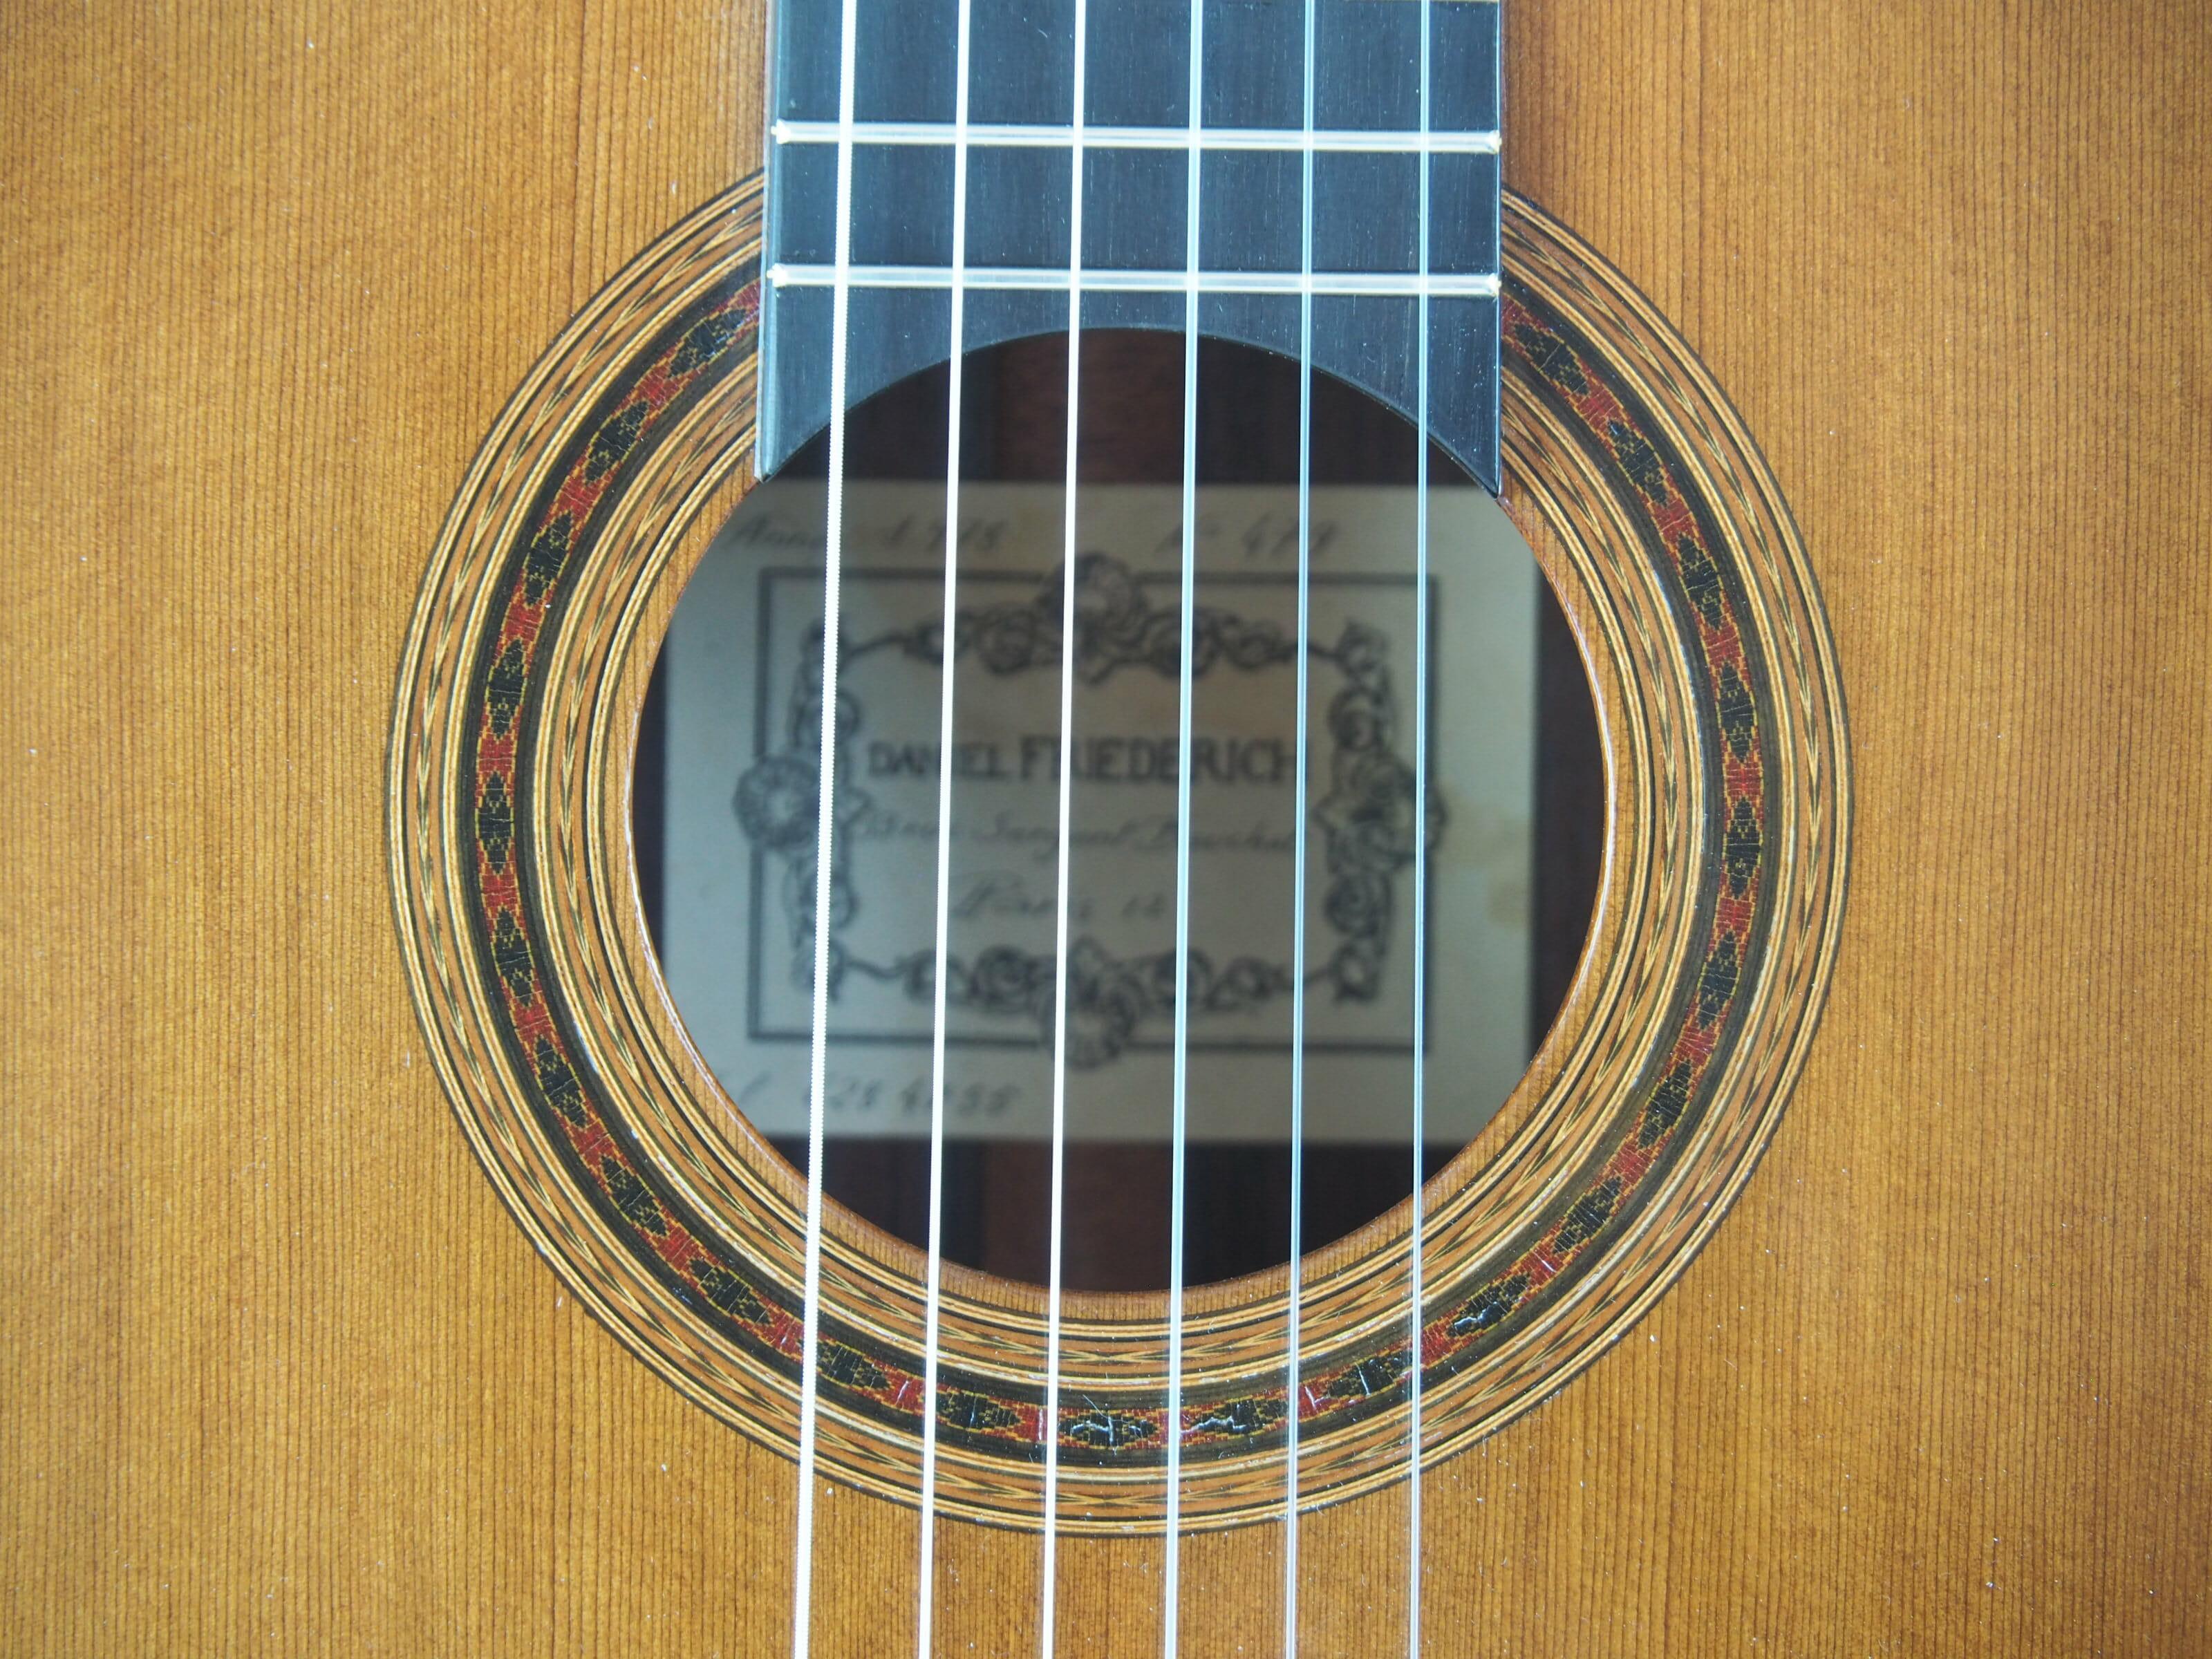 Daniel Friederich luthier guitare classique No 19FRI479-07